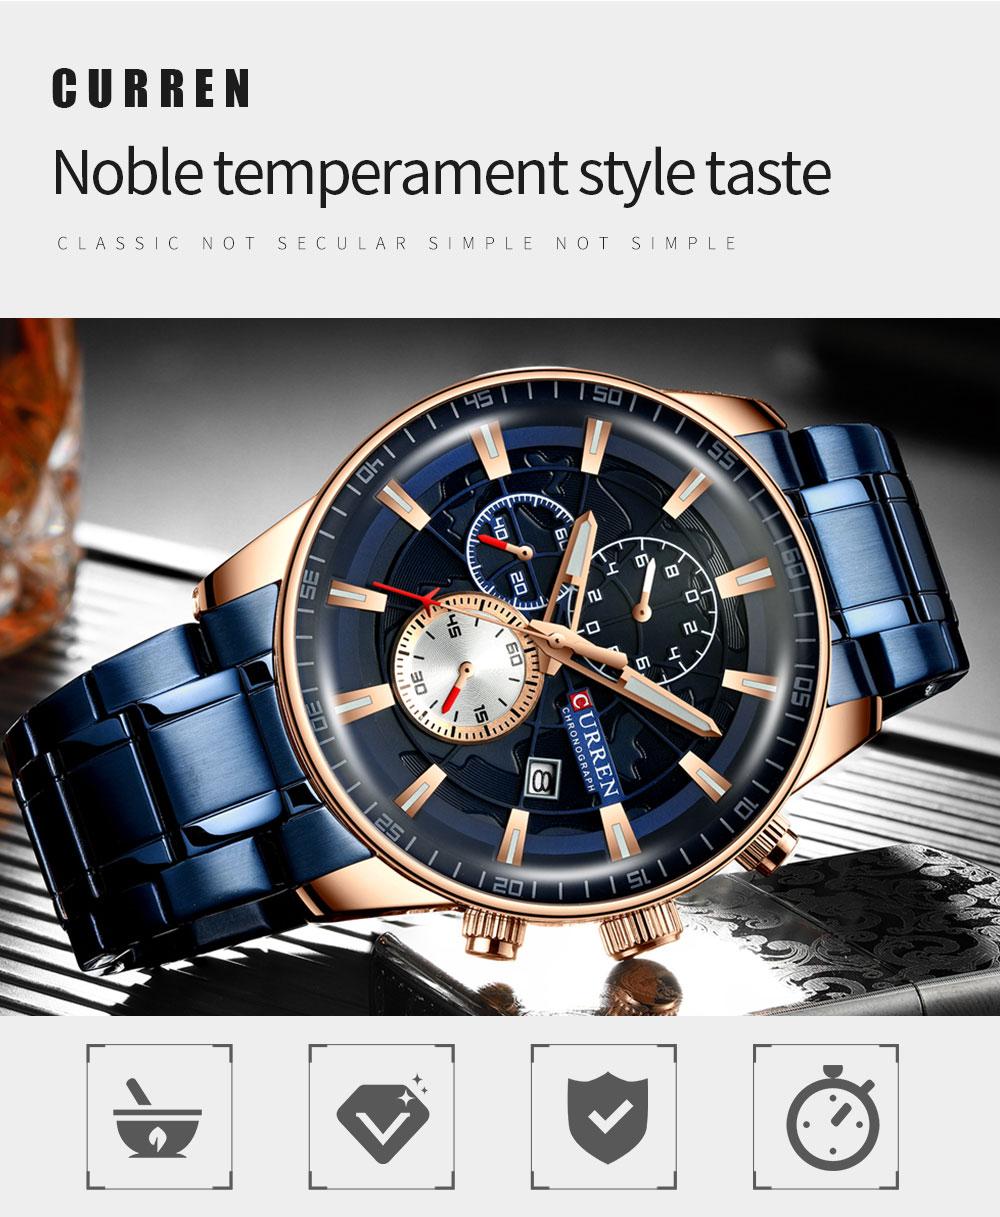 Ha38b26f37b464d97b4ae5fb9b7660fc9k Men's Watches CURREN Top Luxury Brand Fashion Quartz Men Watch Waterproof Chronograph Business Wristwatch Relogio Masculino